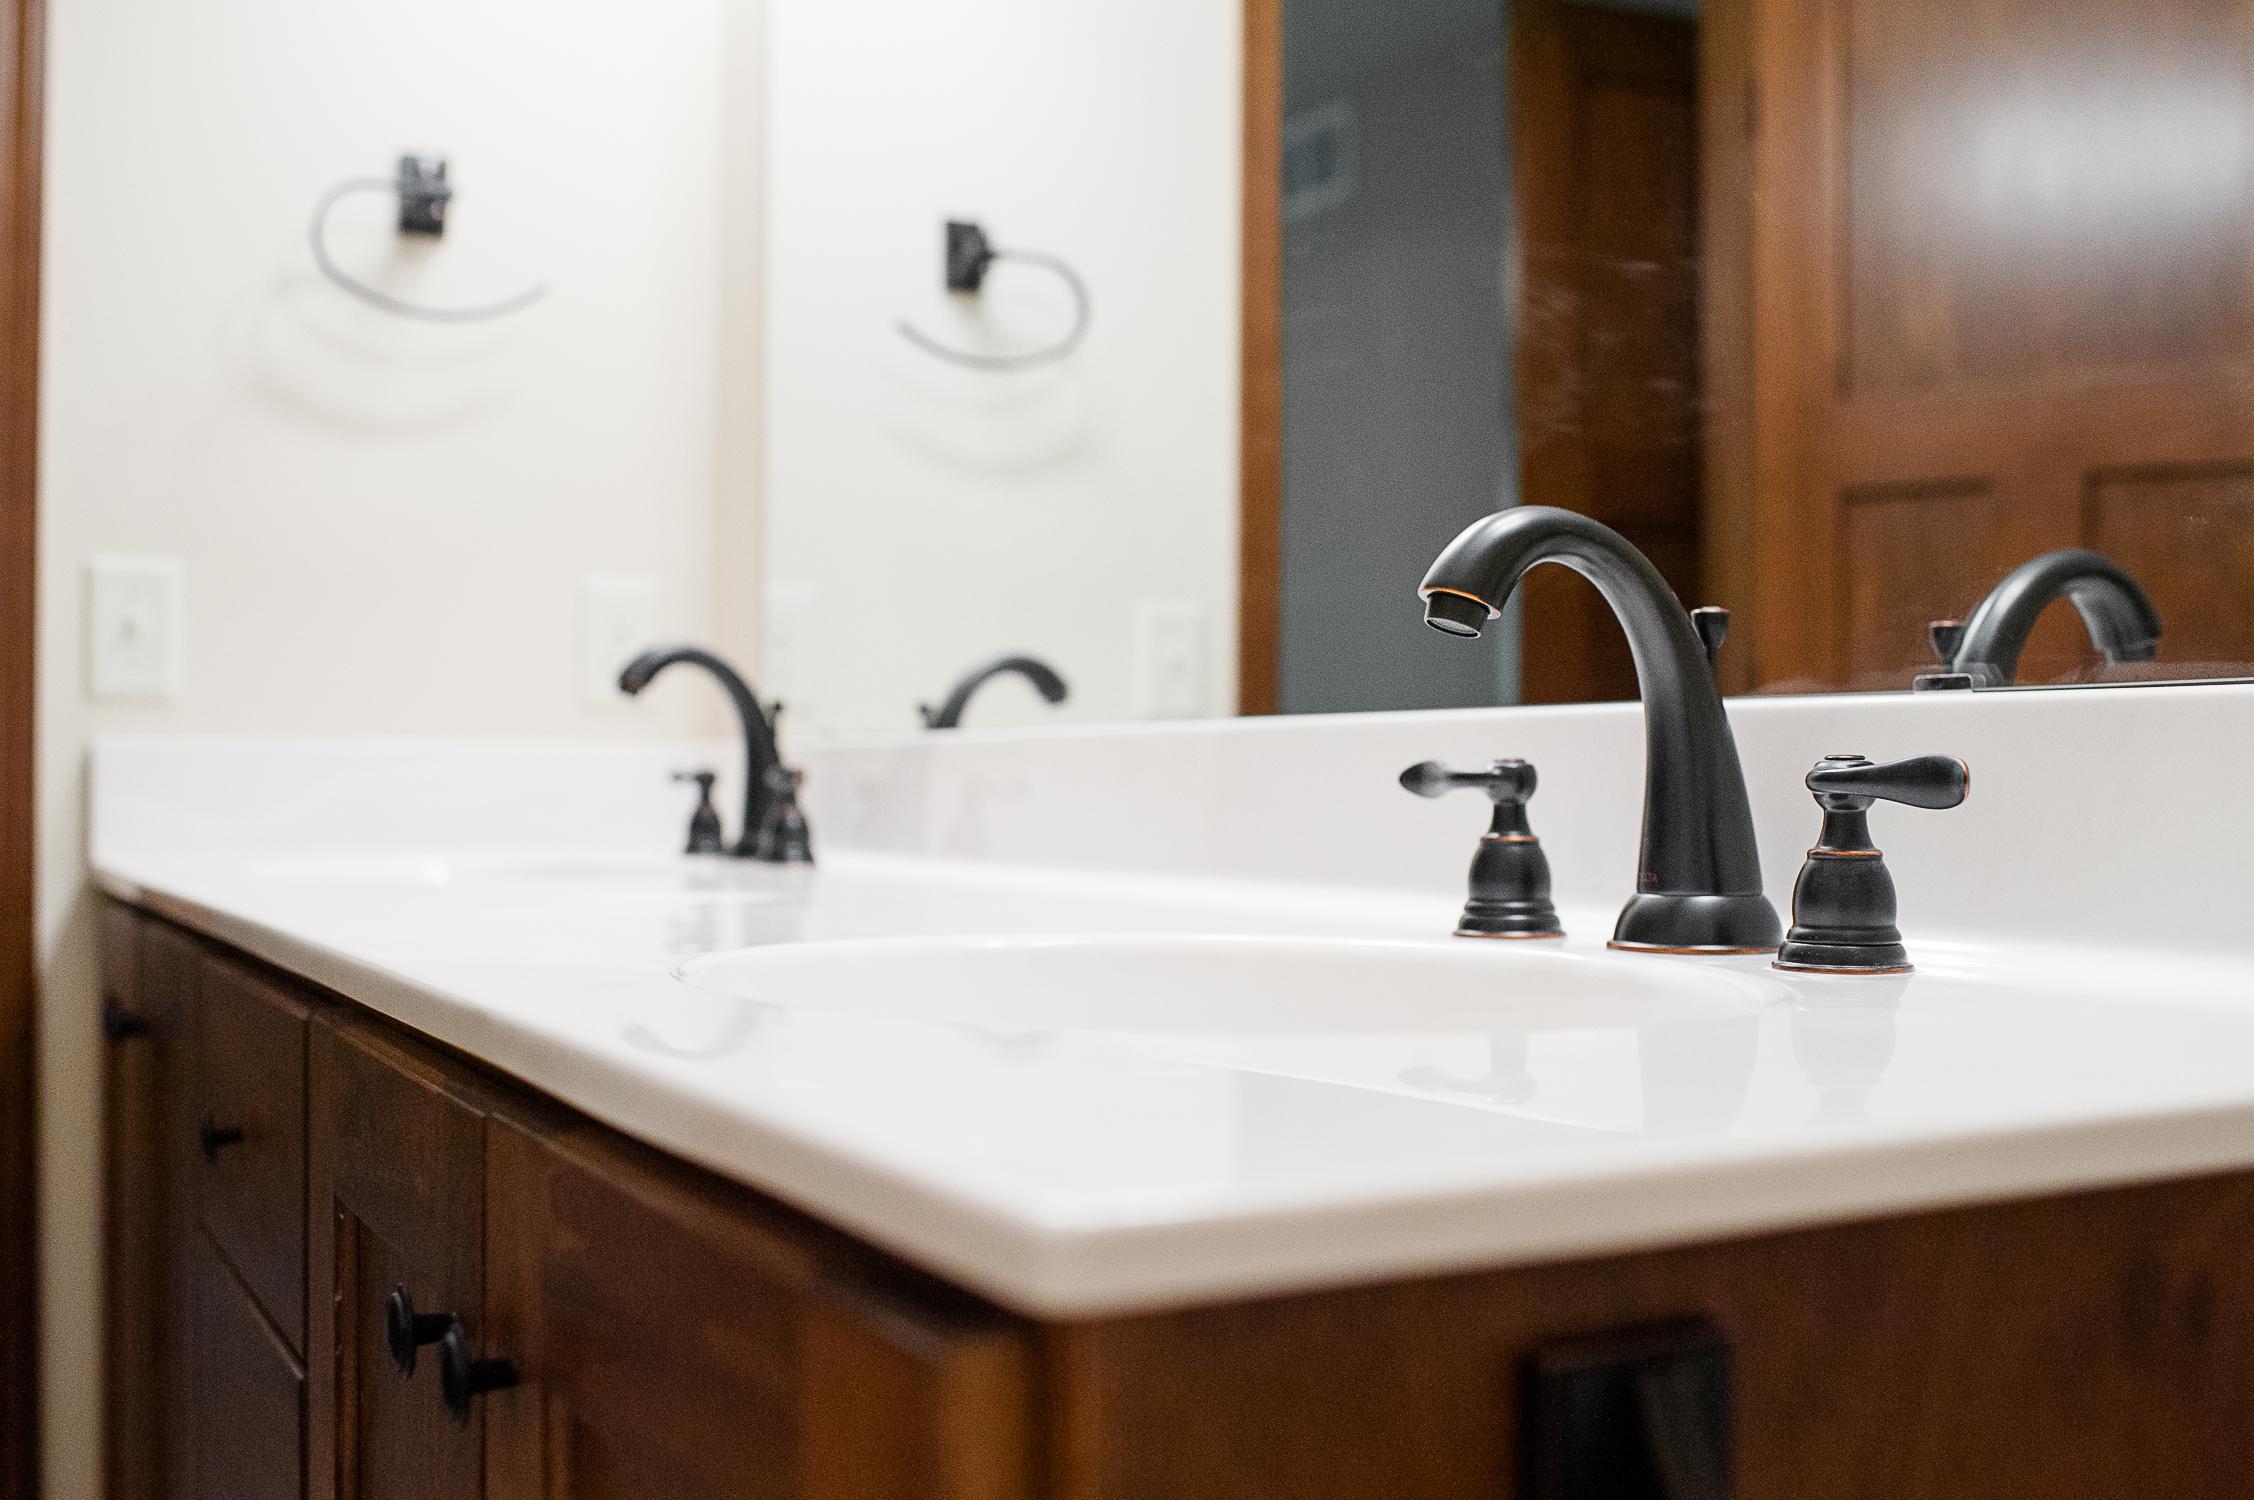 18 - Hoover house Bathroom Satori 2014.jpg